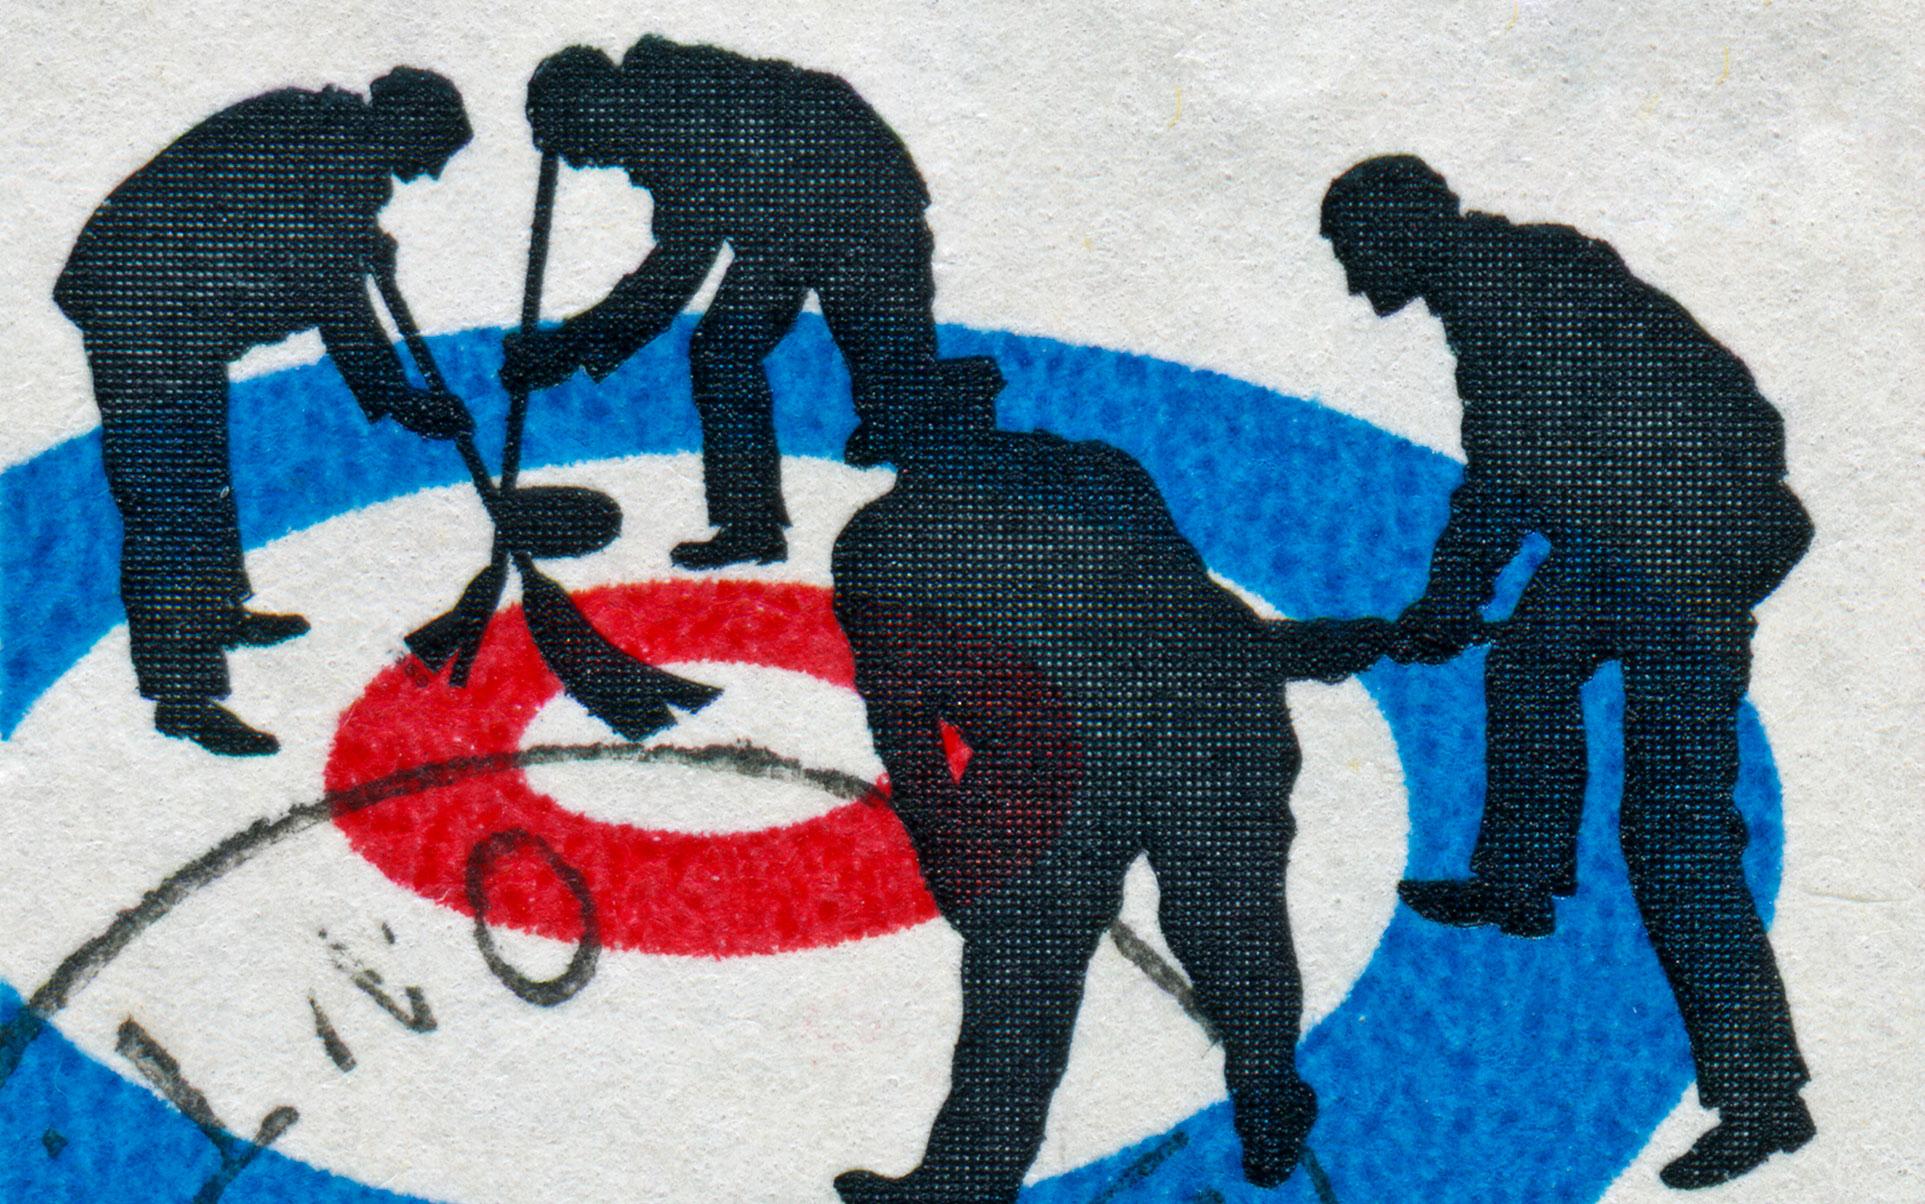 Bongspiel curling